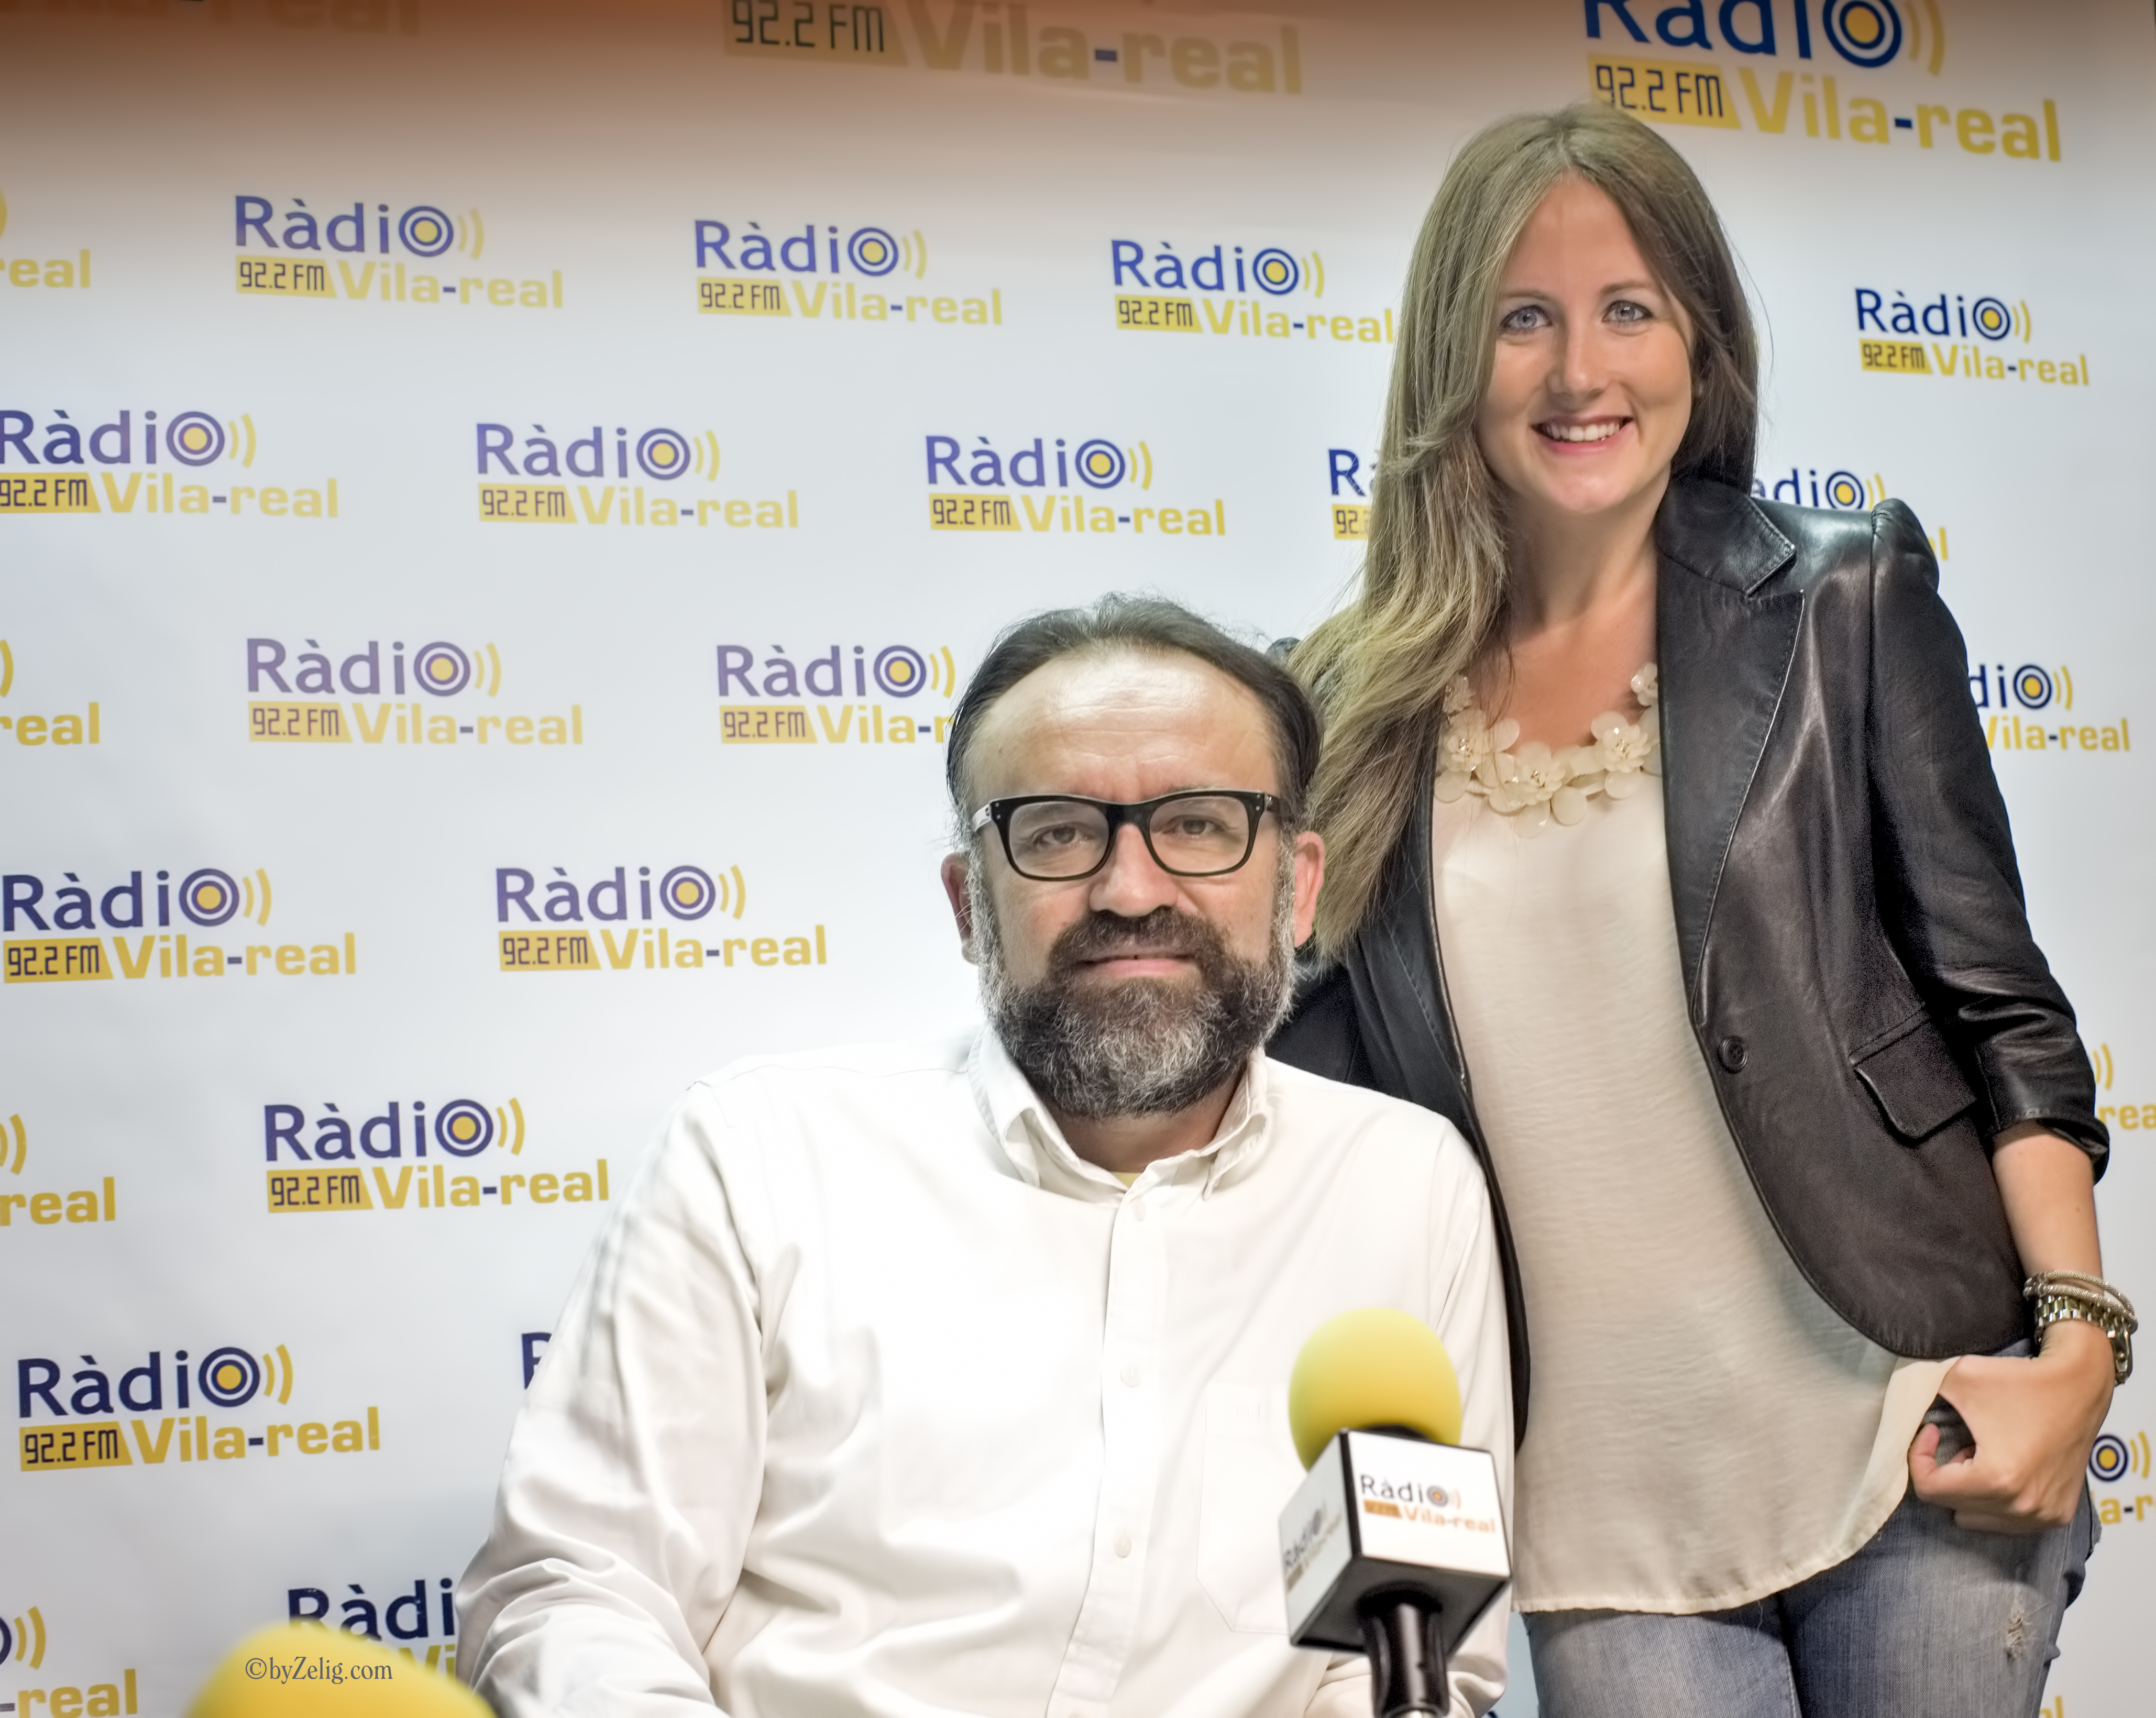 Esports Radio Vila-real. Programa del 19 de febrero 2018